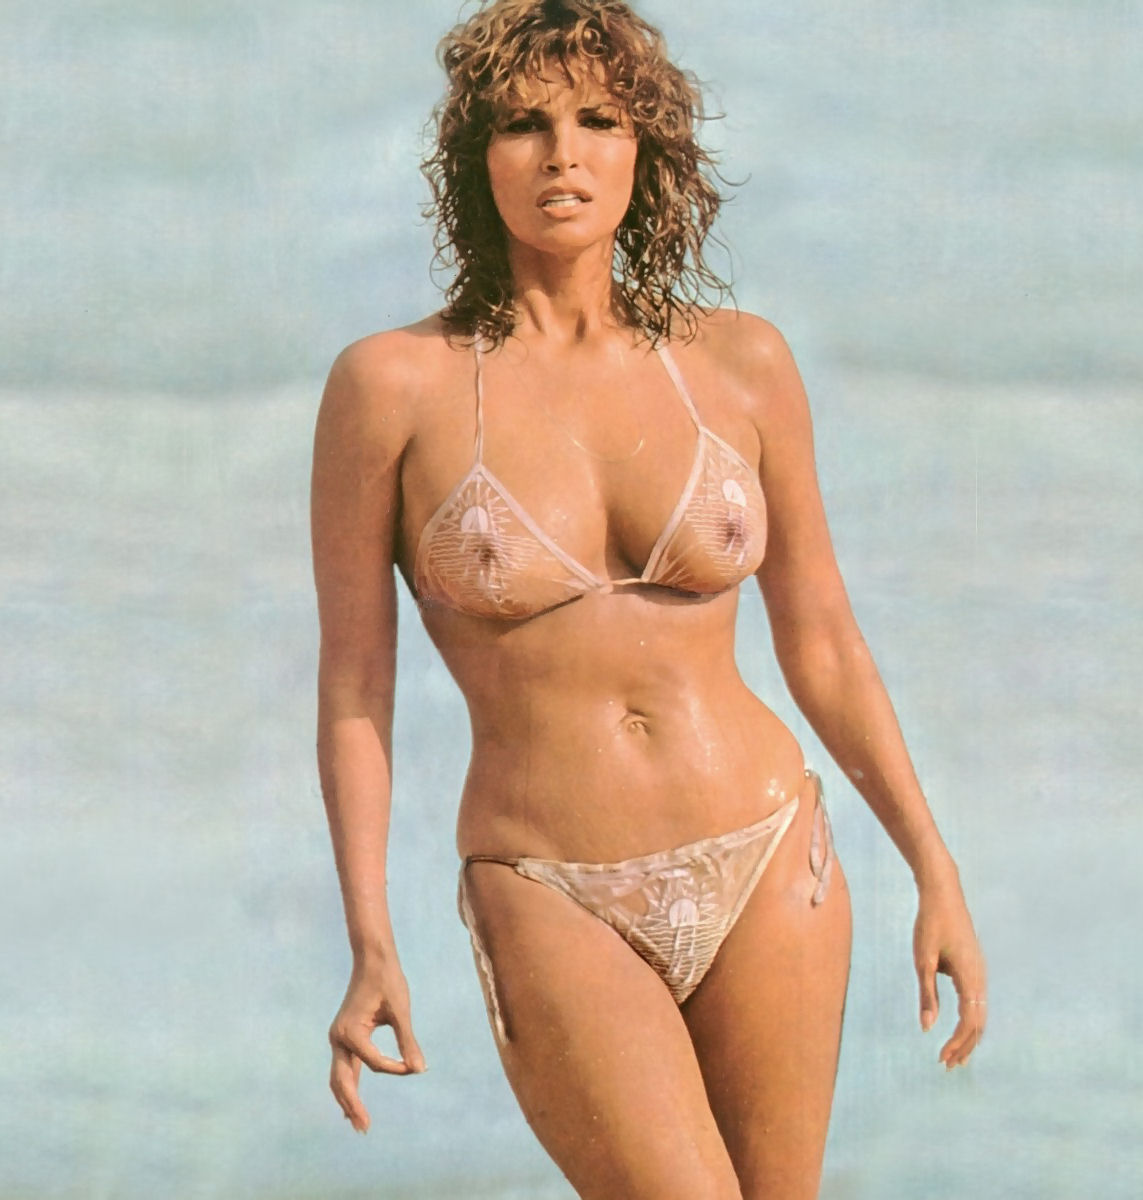 Raquel Welch Half Nude in Transparent Bikini